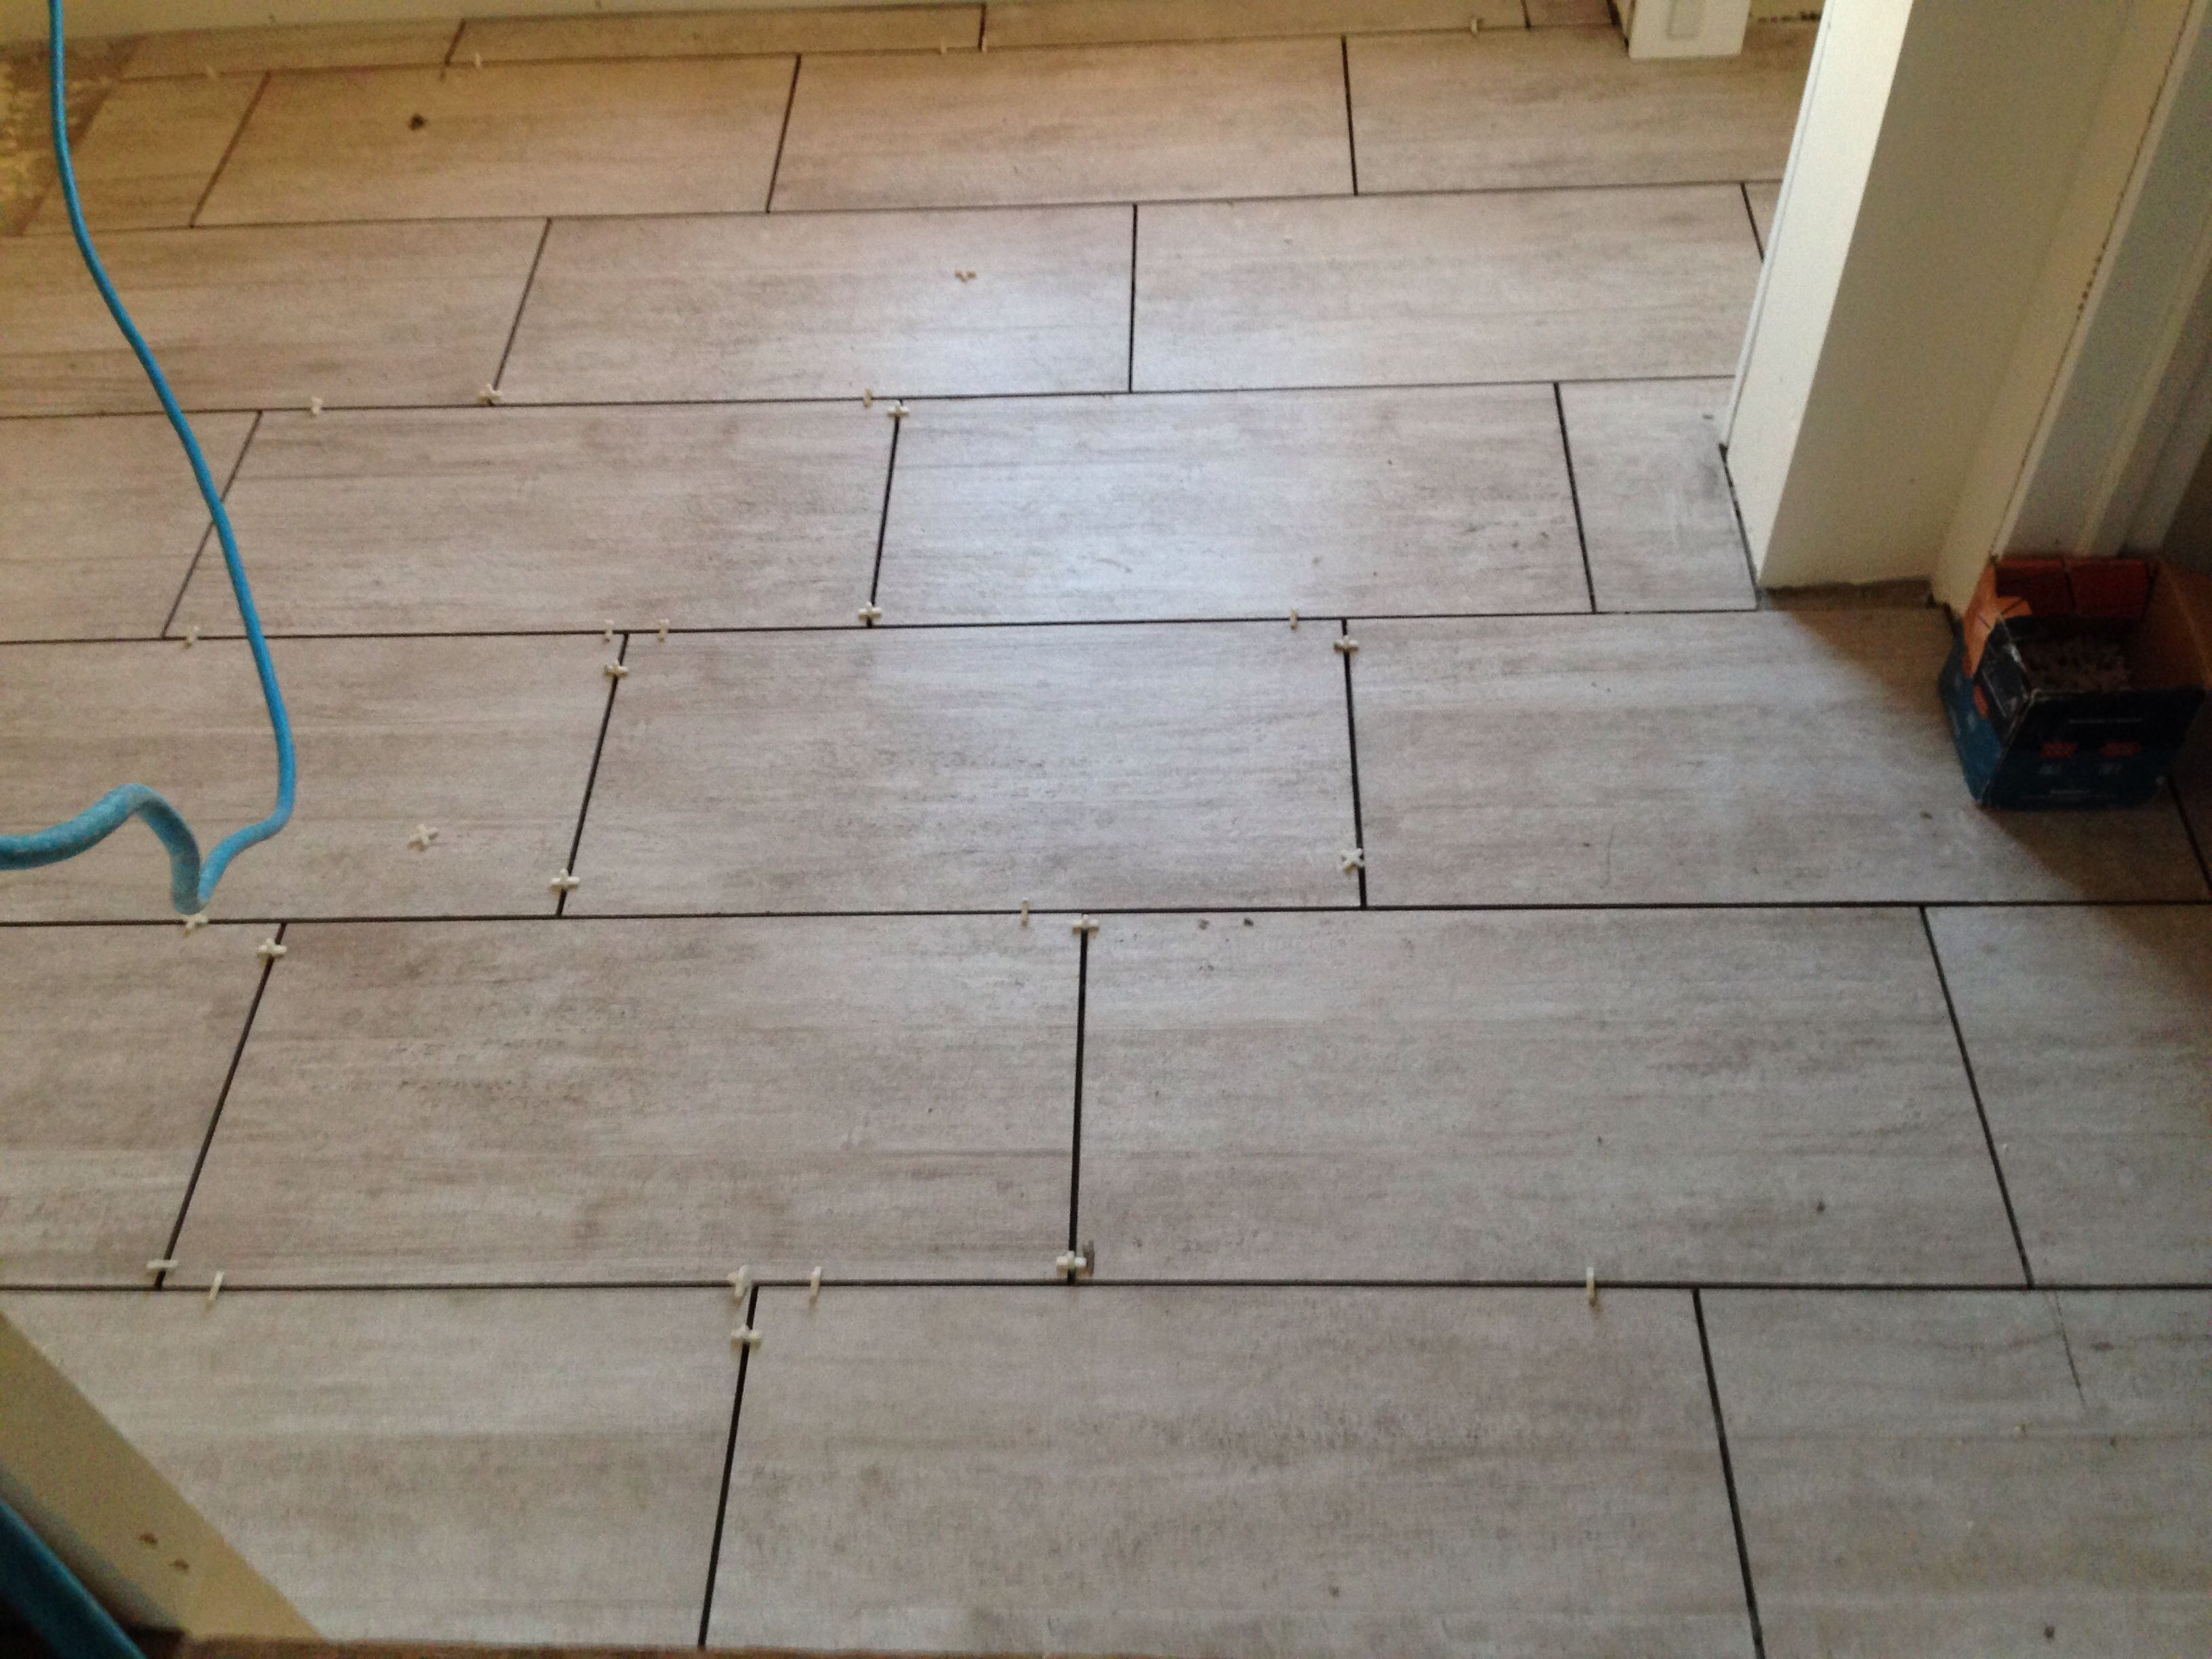 12x24 Master Bath Tile 12x24 Tile Patterns Tile Layout